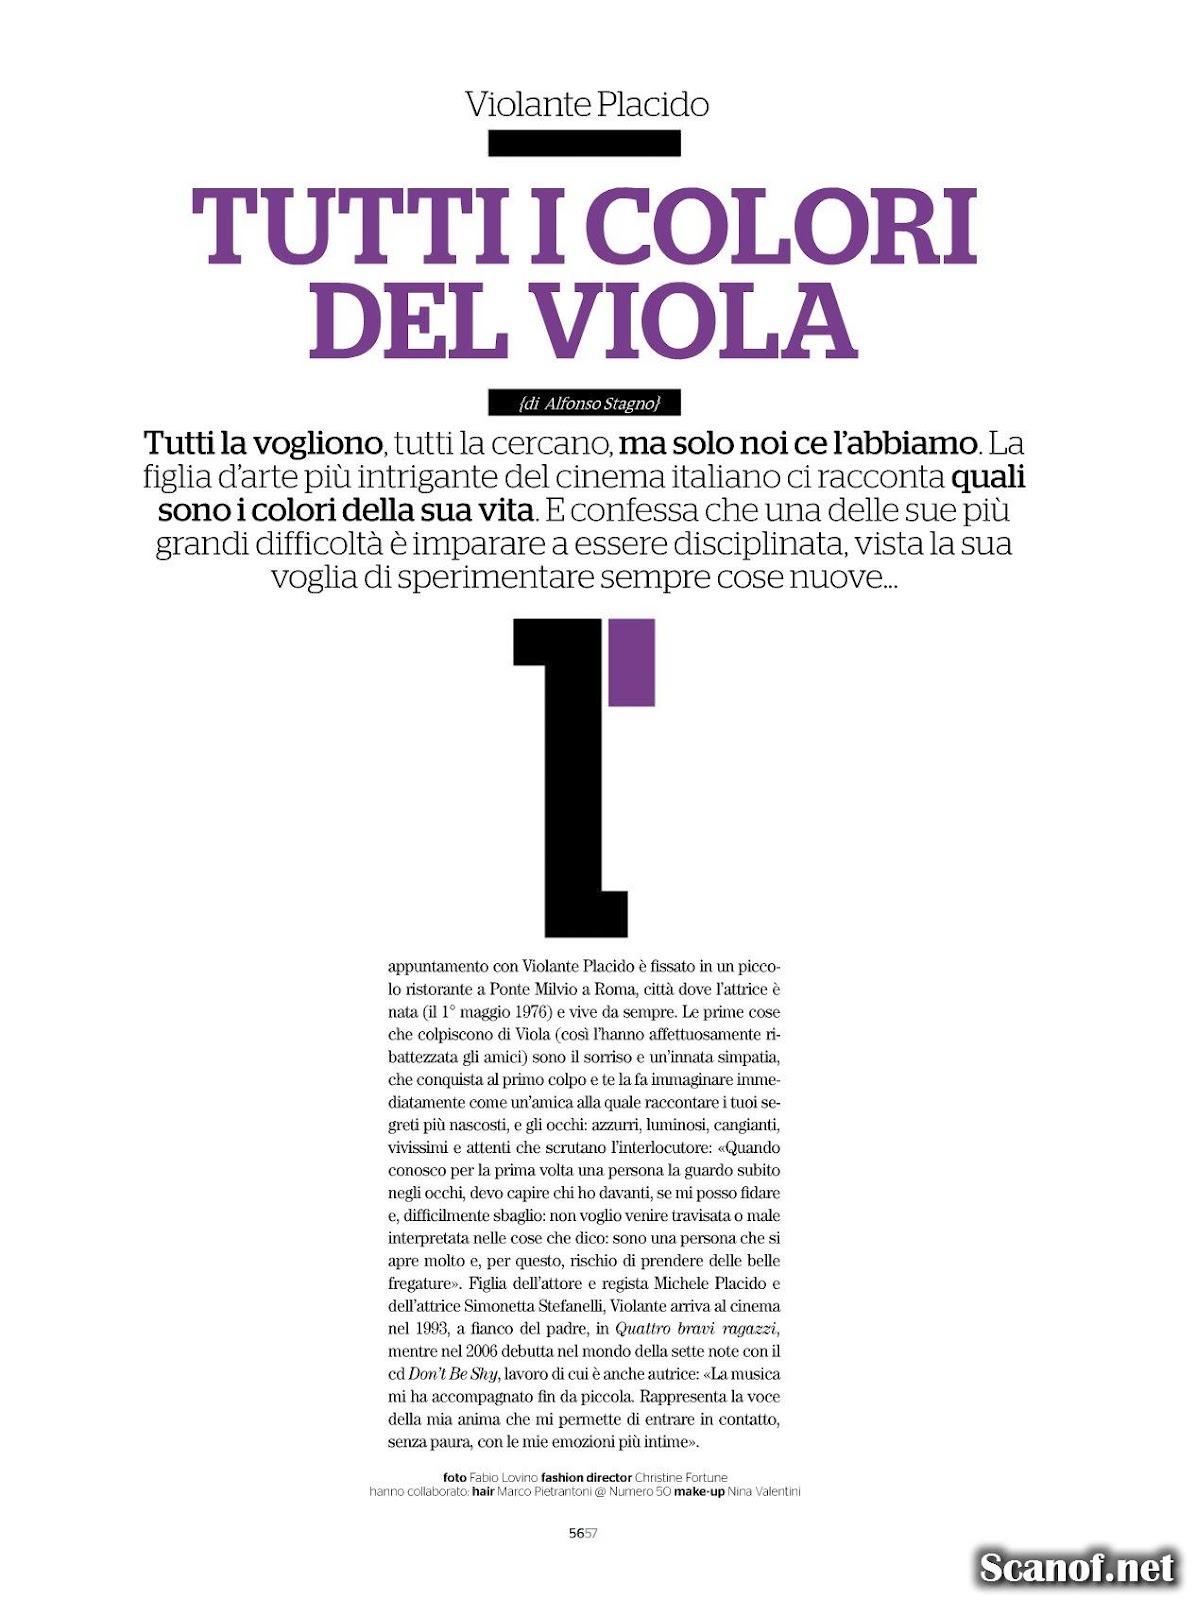 http://4.bp.blogspot.com/-W2a8EBSG0KE/T-kMbwBkCqI/AAAAAAAAIdg/ri_VwLwFndc/s1600/Playboy_2009-02_Italy_Scanof.net_056.jpg